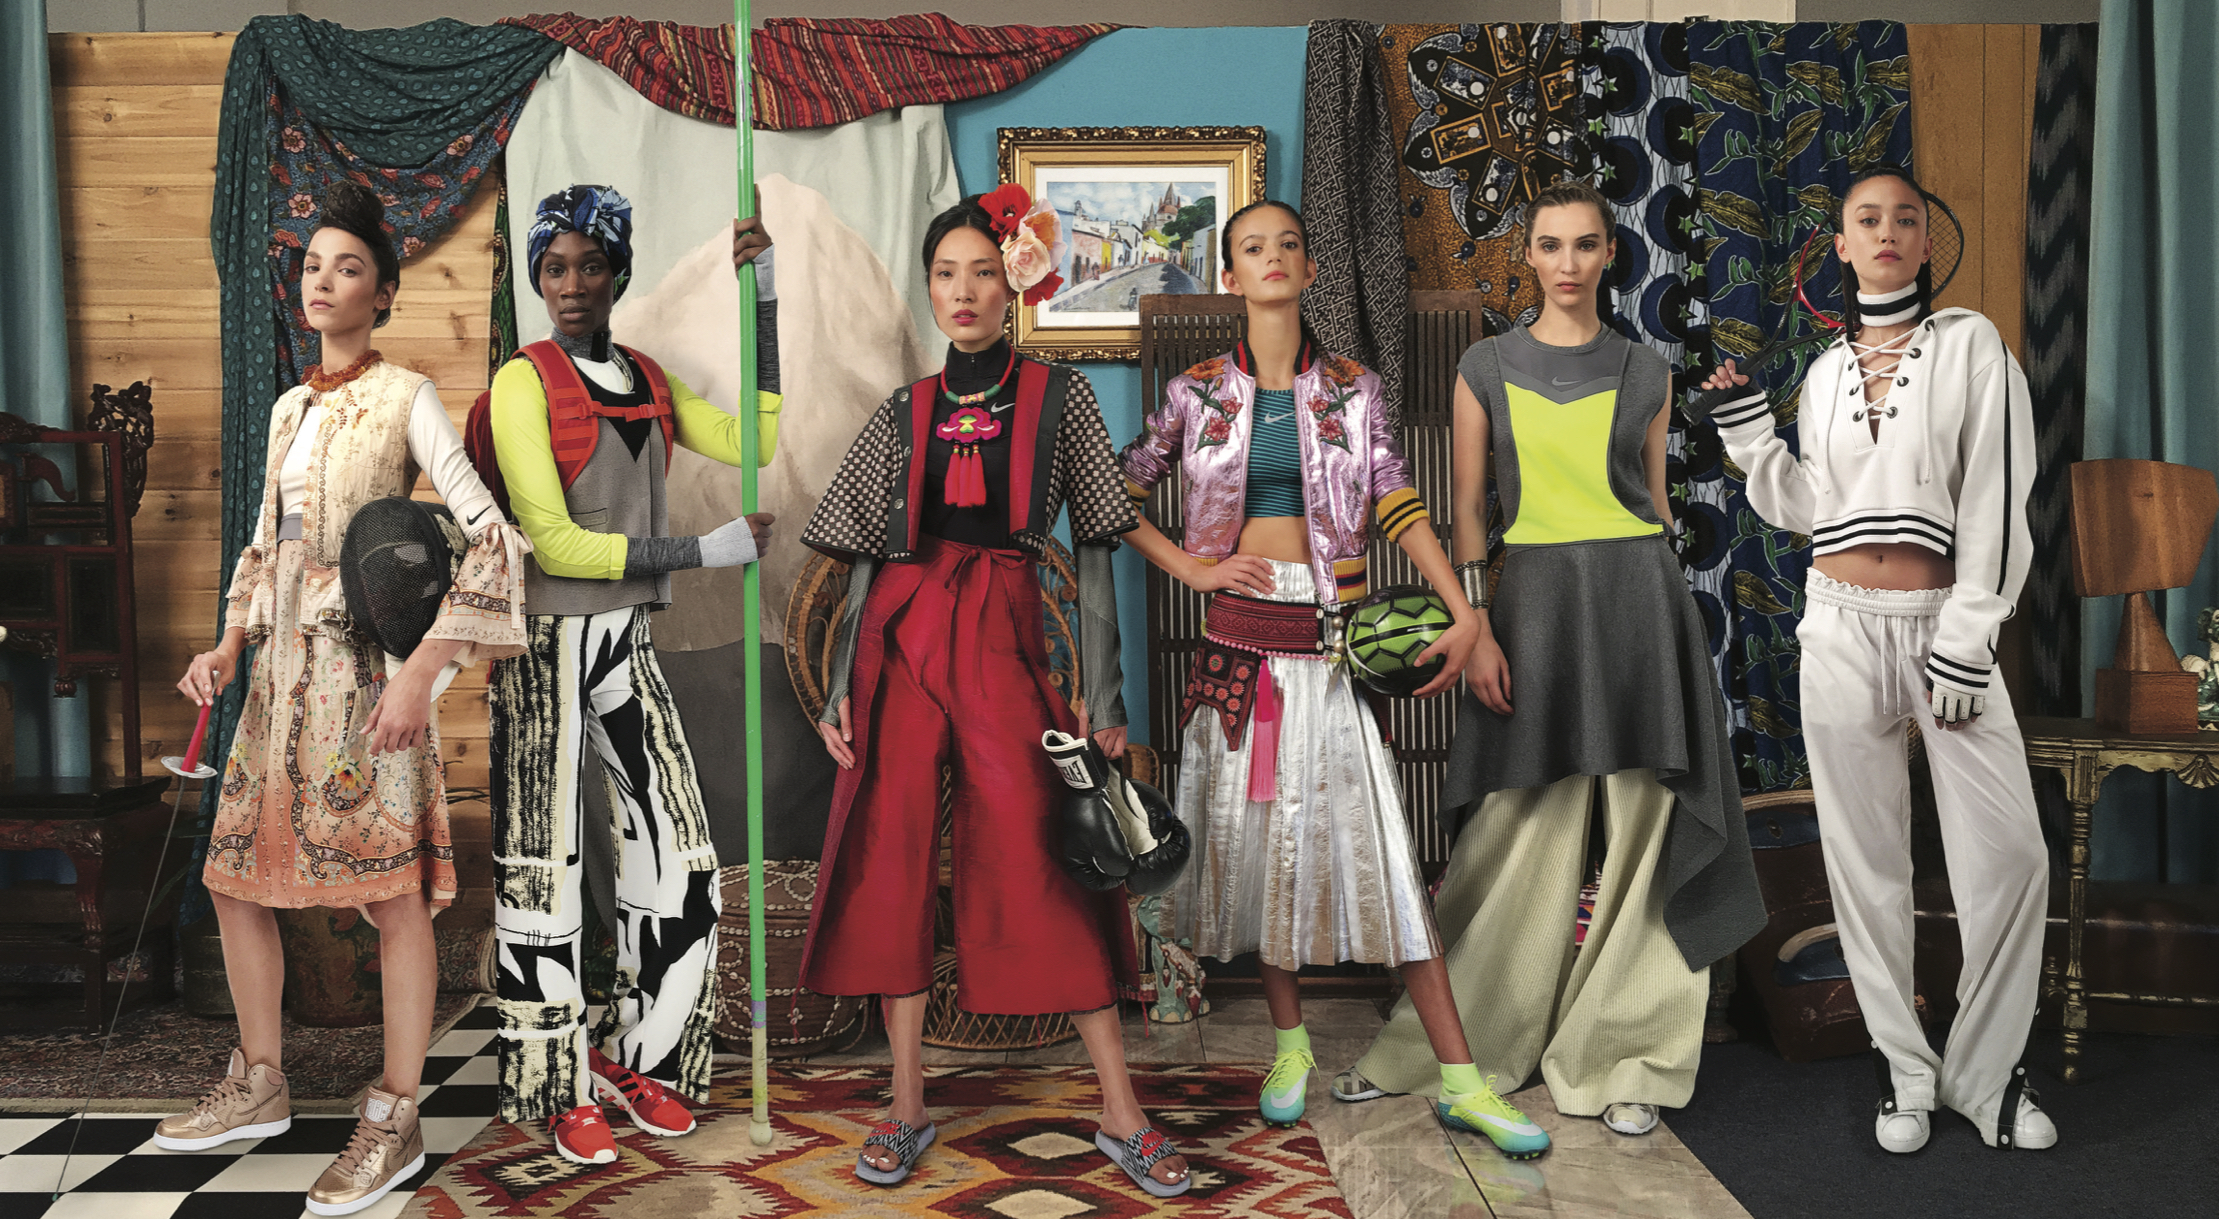 Harper's Bazaar: Brazil - No Ritmo Do EsporteJuly/August 2016Styled by Tasha GreenPhotography by Chris Hornbecker